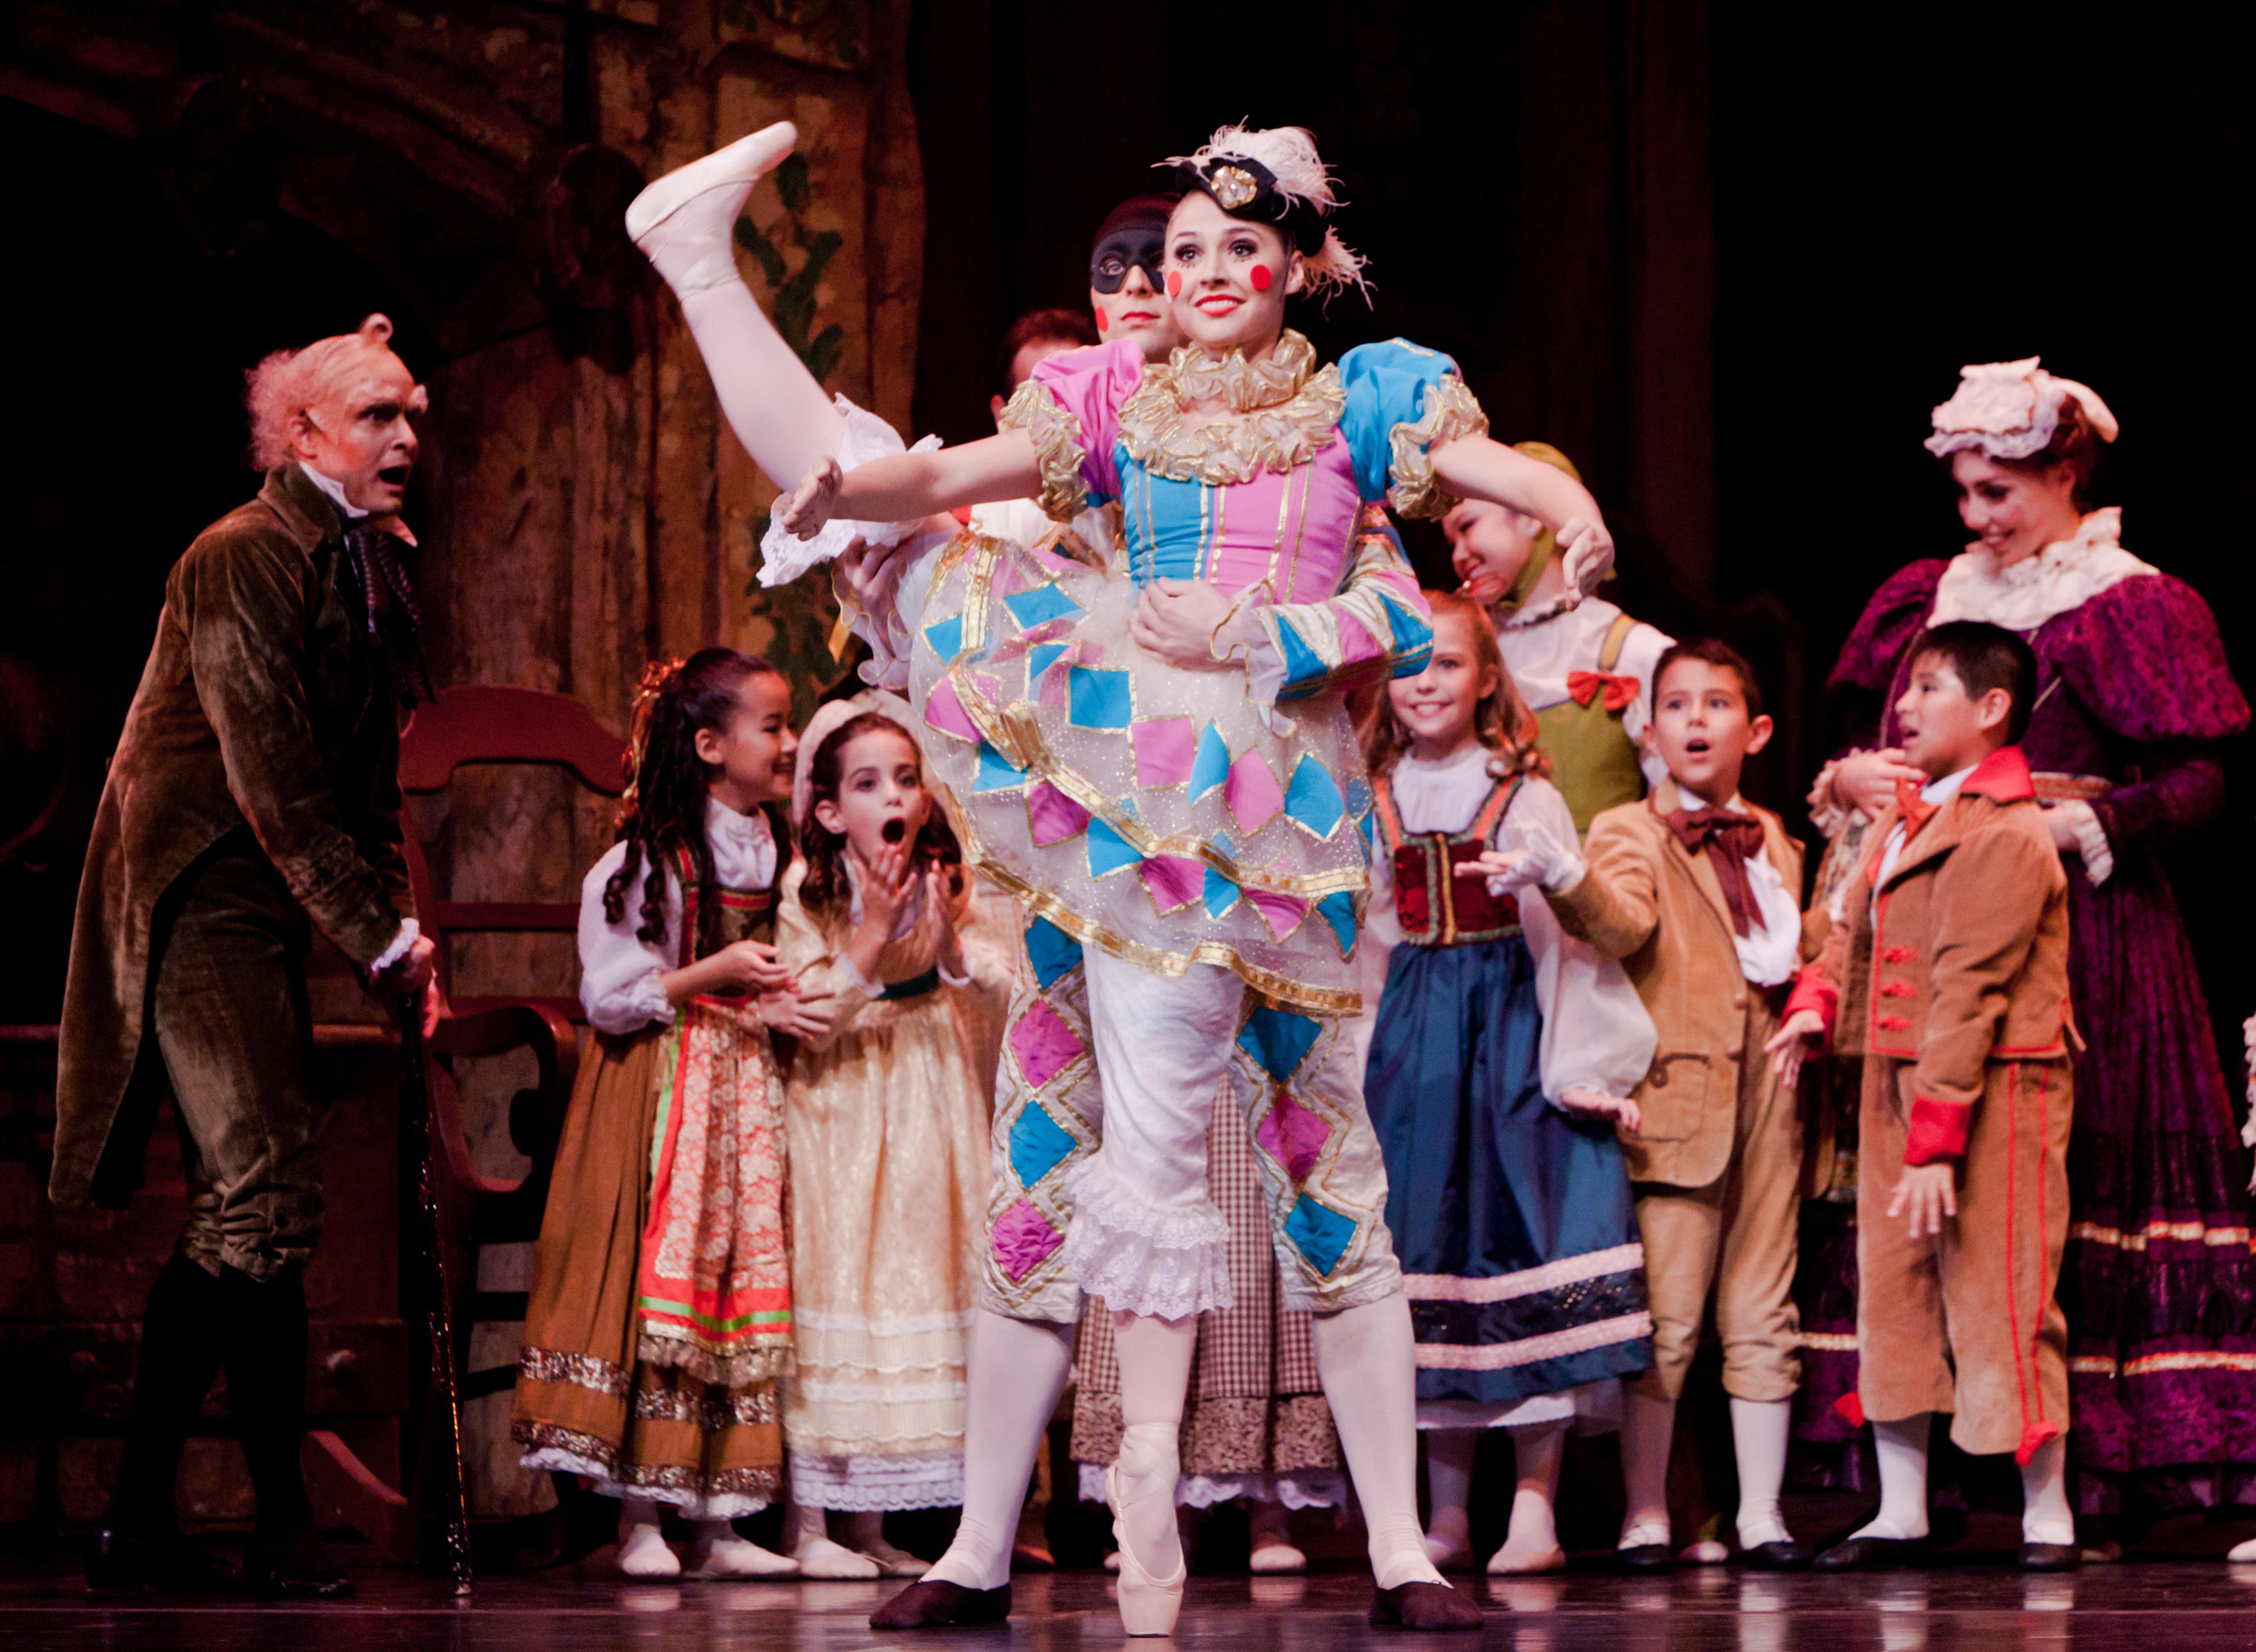 Houston Balletu2019s Joyful NUTCRACKER Exceeds Expectations : The Peopleu0026#39;s Critic